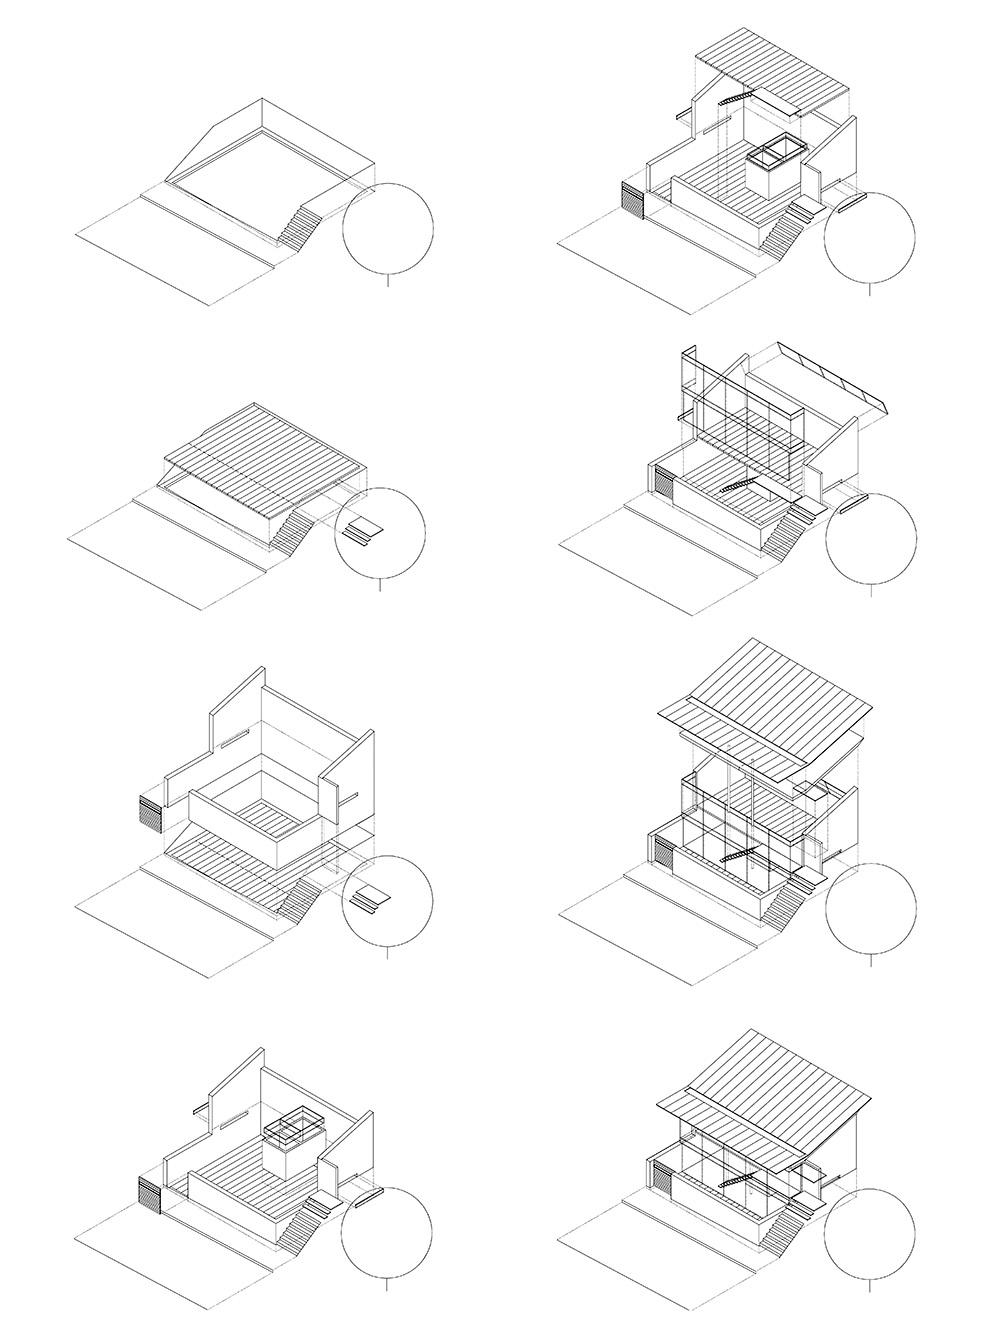 Design Engine Hatherley Studio